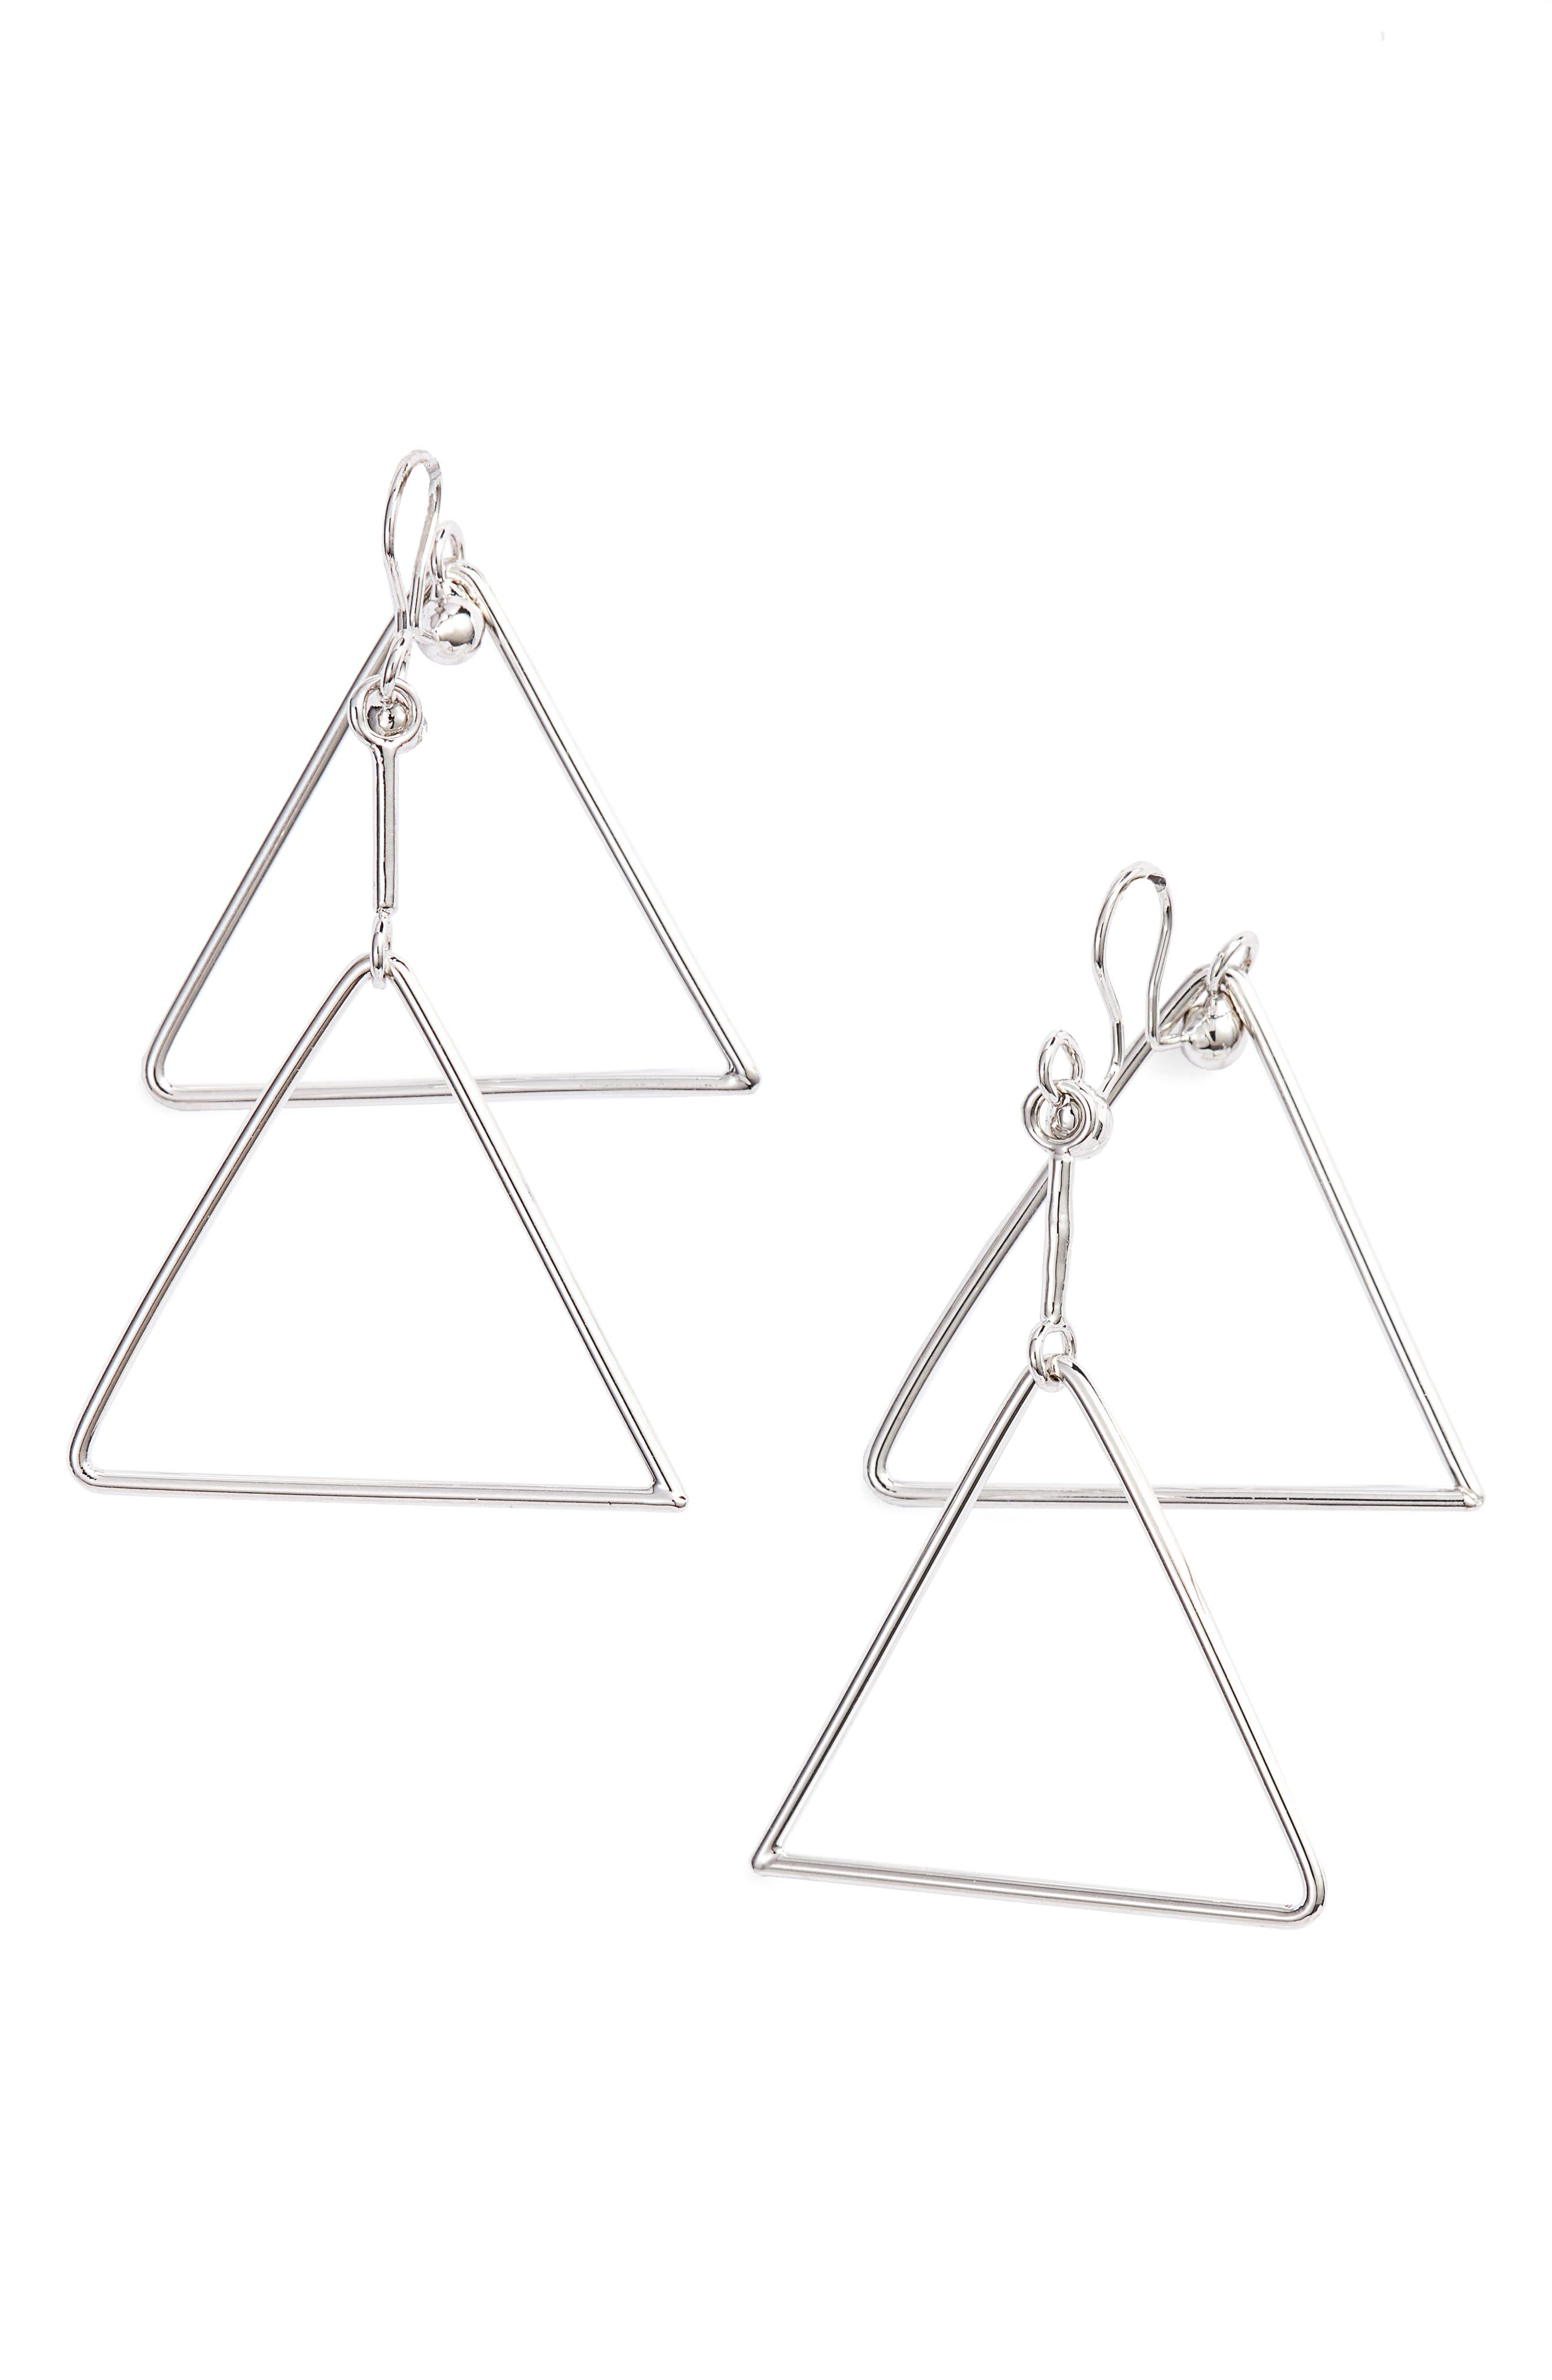 Triangle Clip Earrings,                             Main thumbnail 1, color,                             Silver